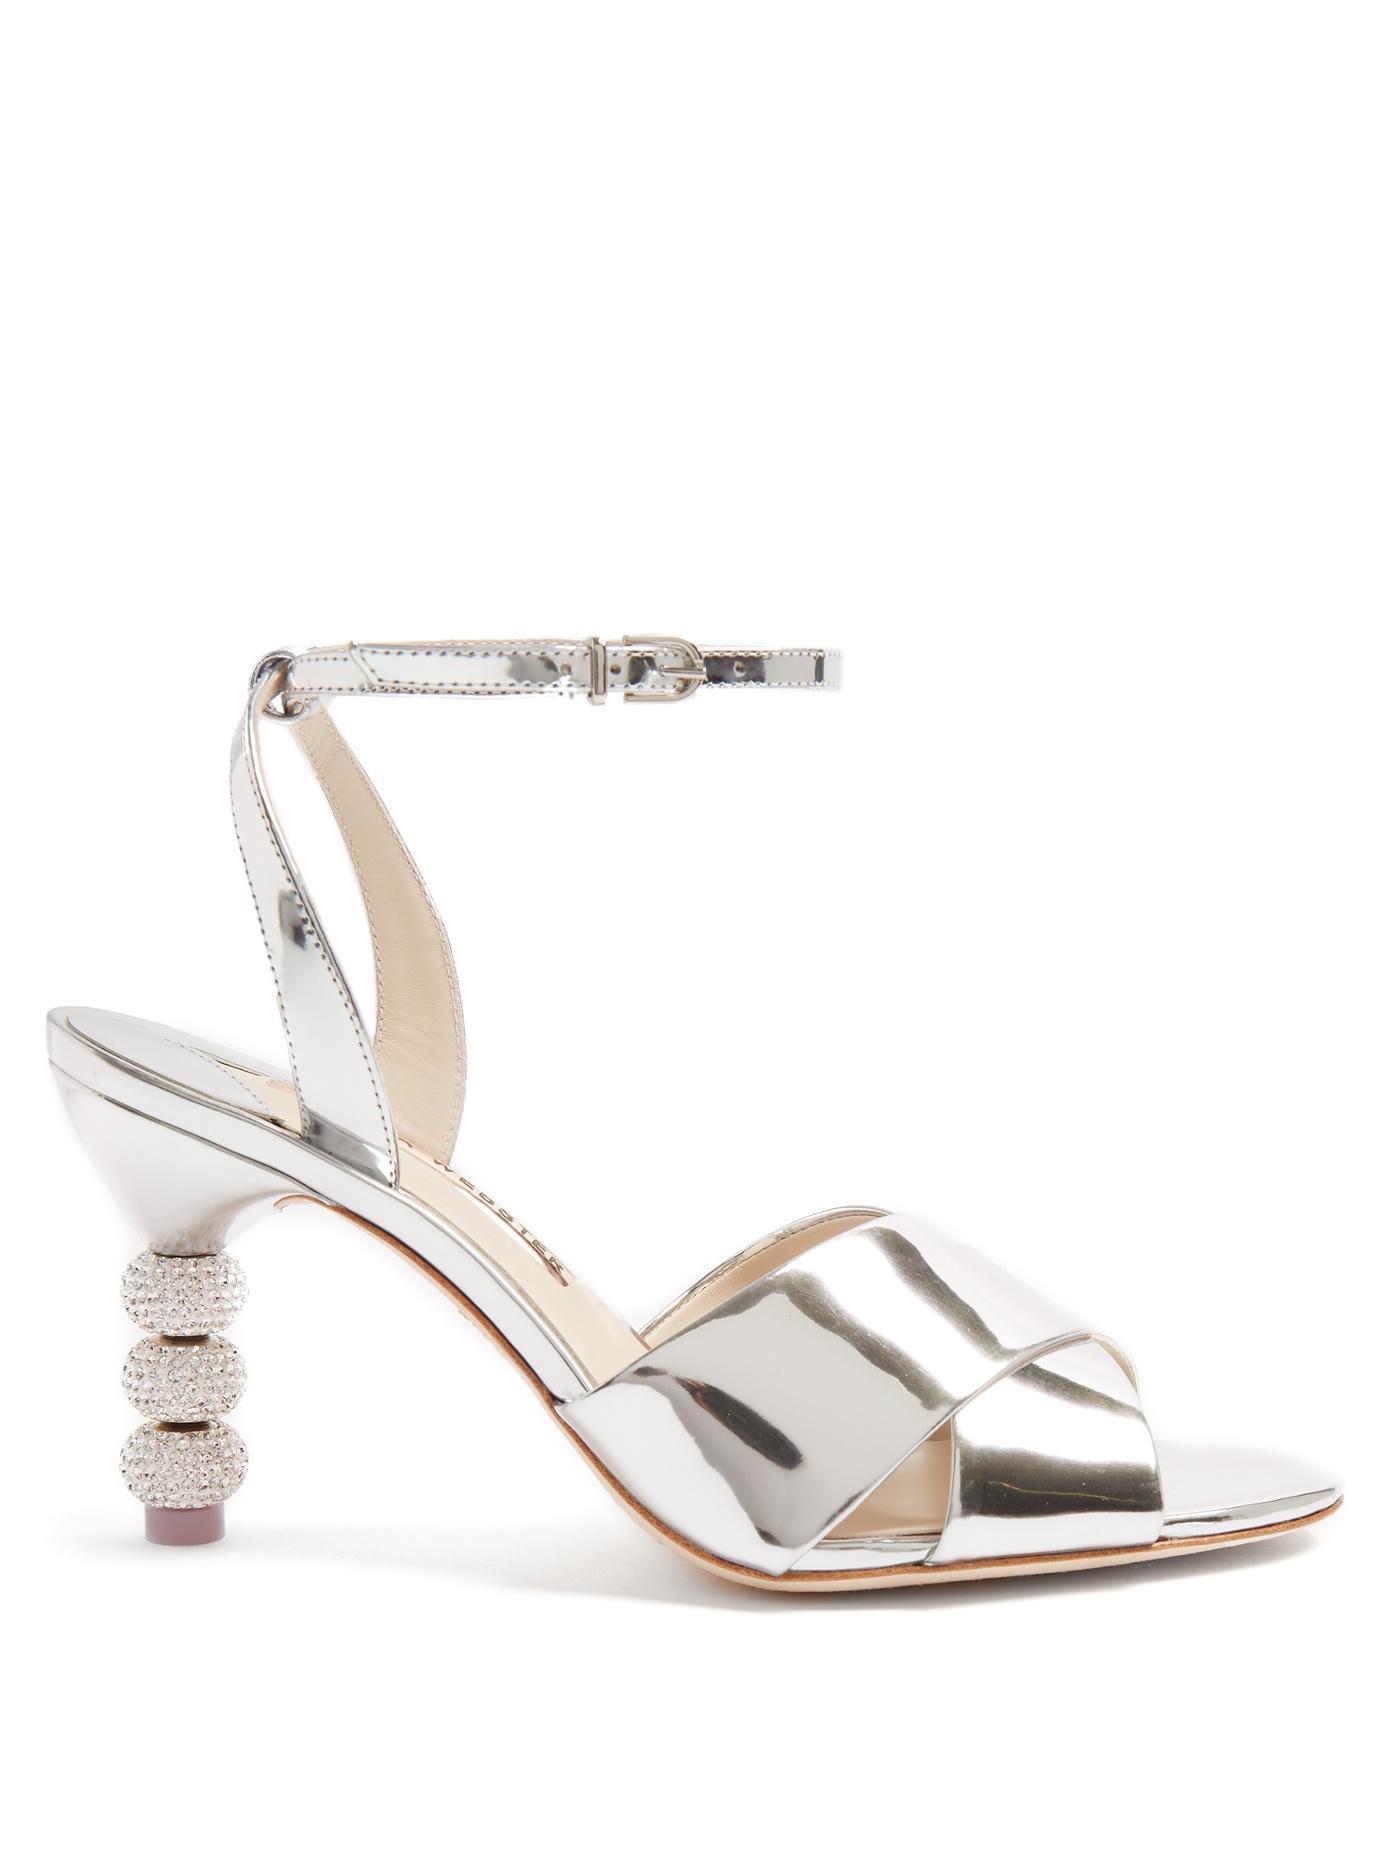 Silver Natalia crystal 85 leather sandals - Metallic Sophia Webster 5e6p4G